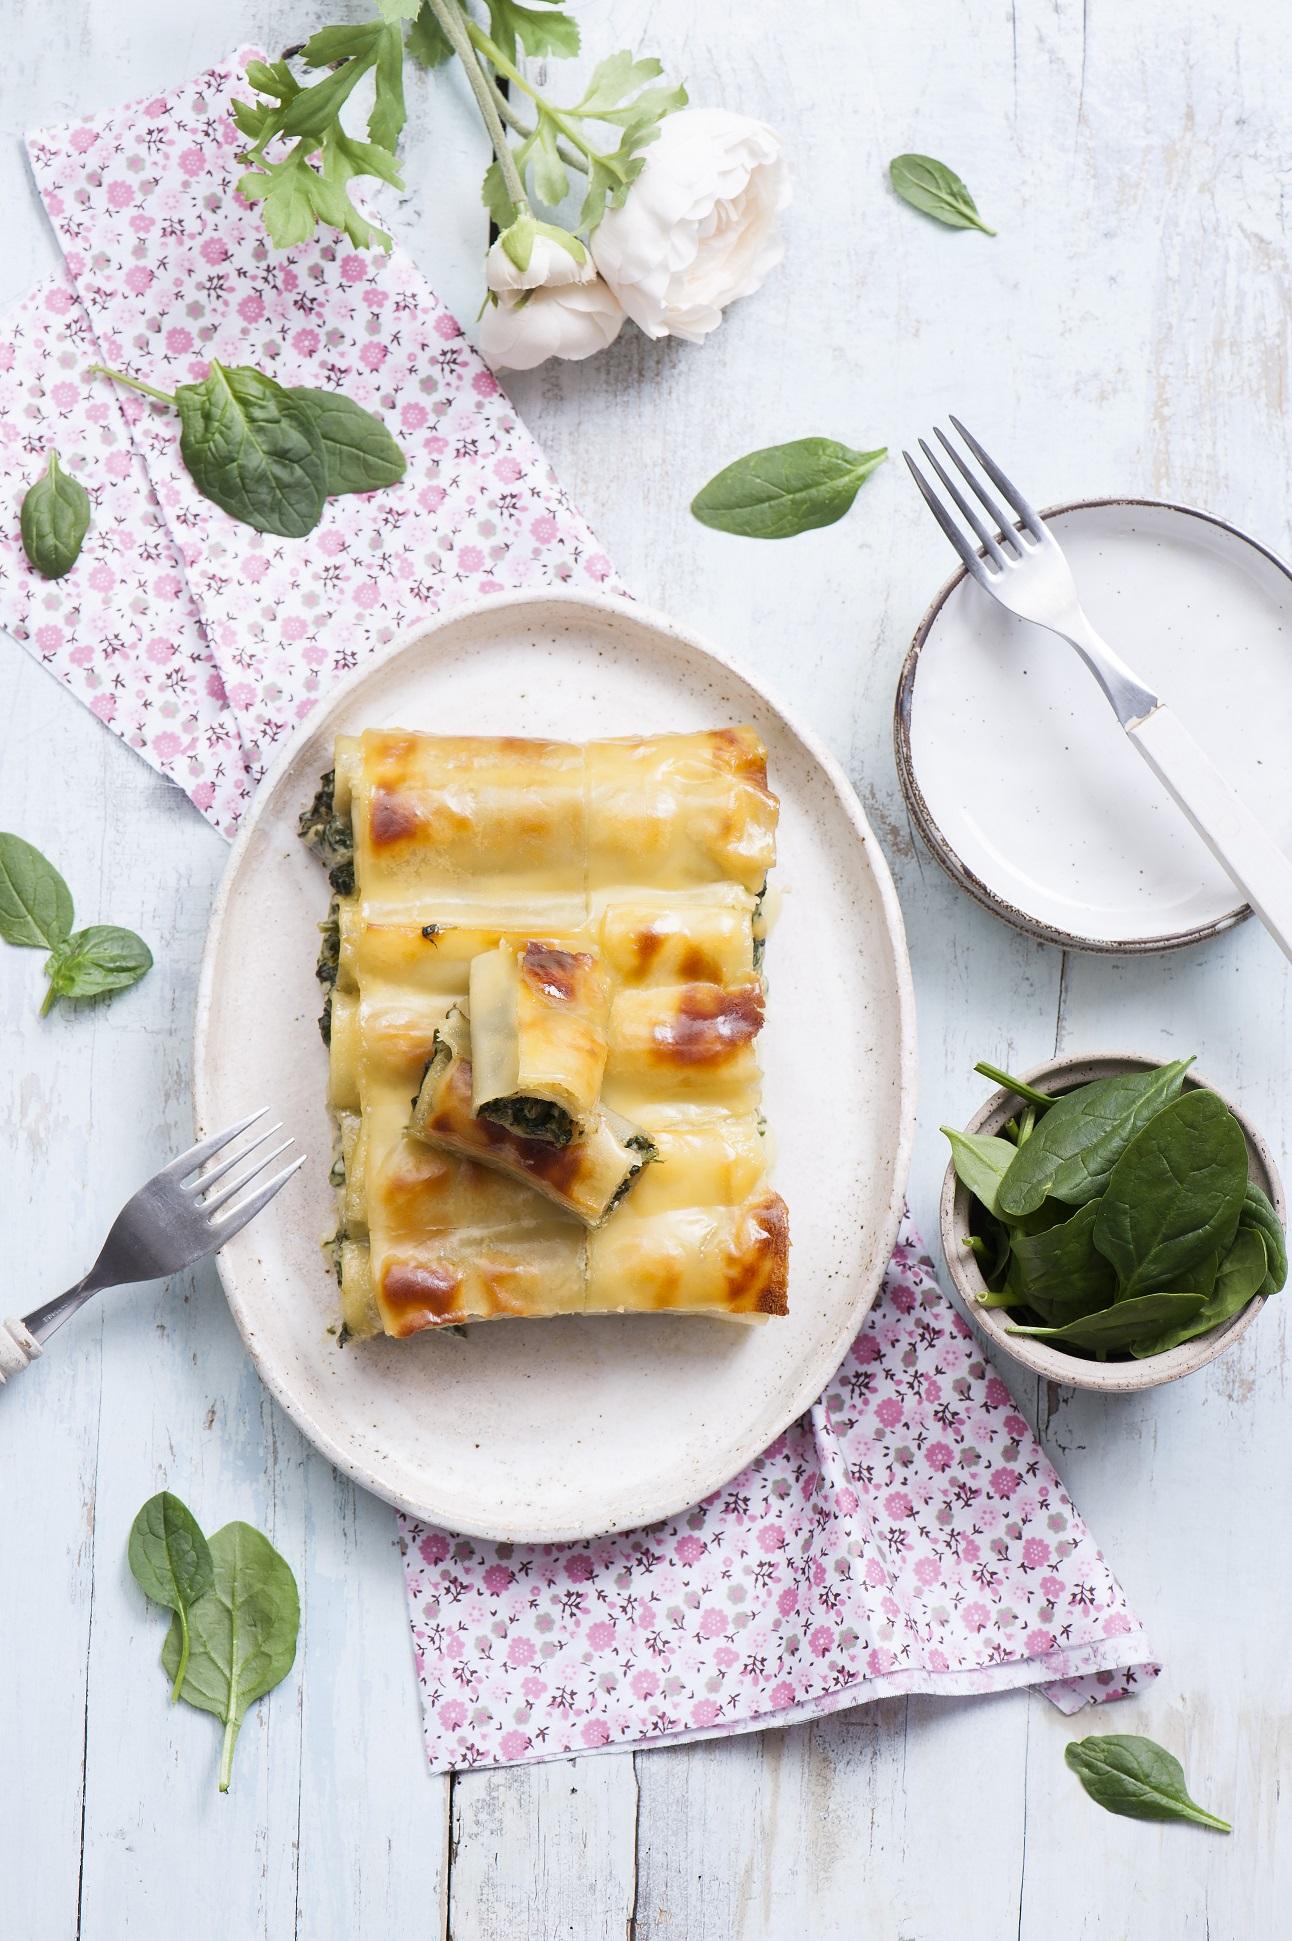 Cannelloni ze szpinakiem i kremowym serem Hochland